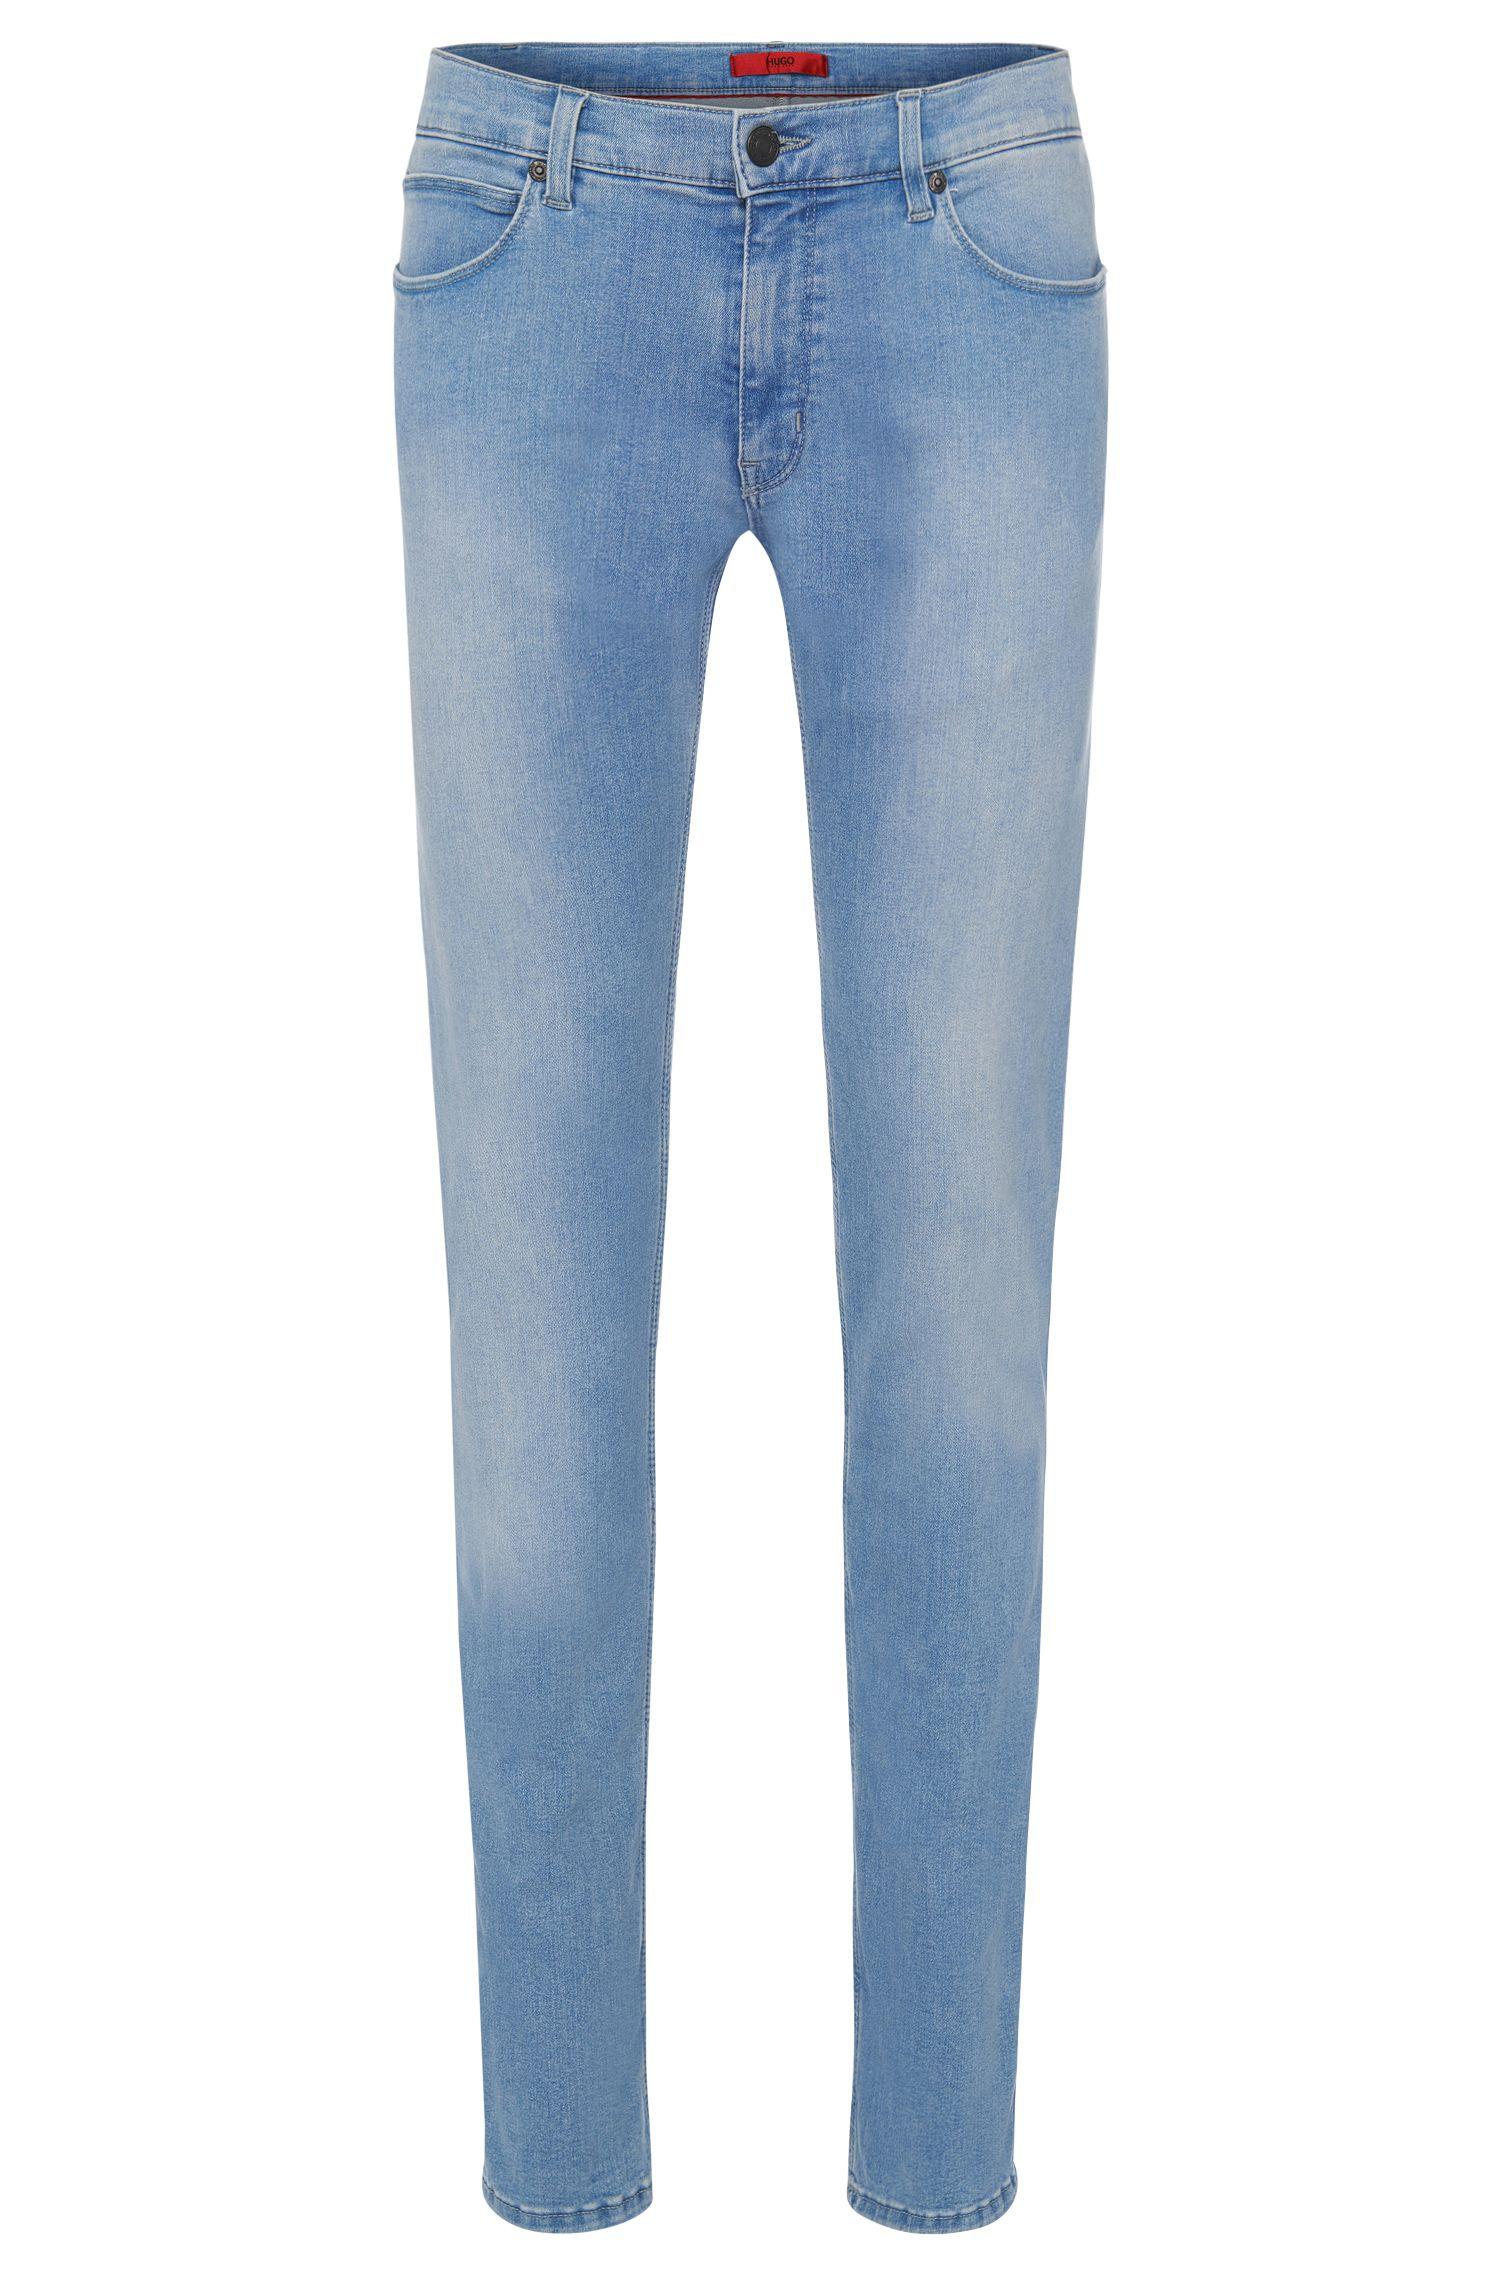 11.75 oz Stretch Cotton Blend Jeans, Slim Fit | Hugo 708